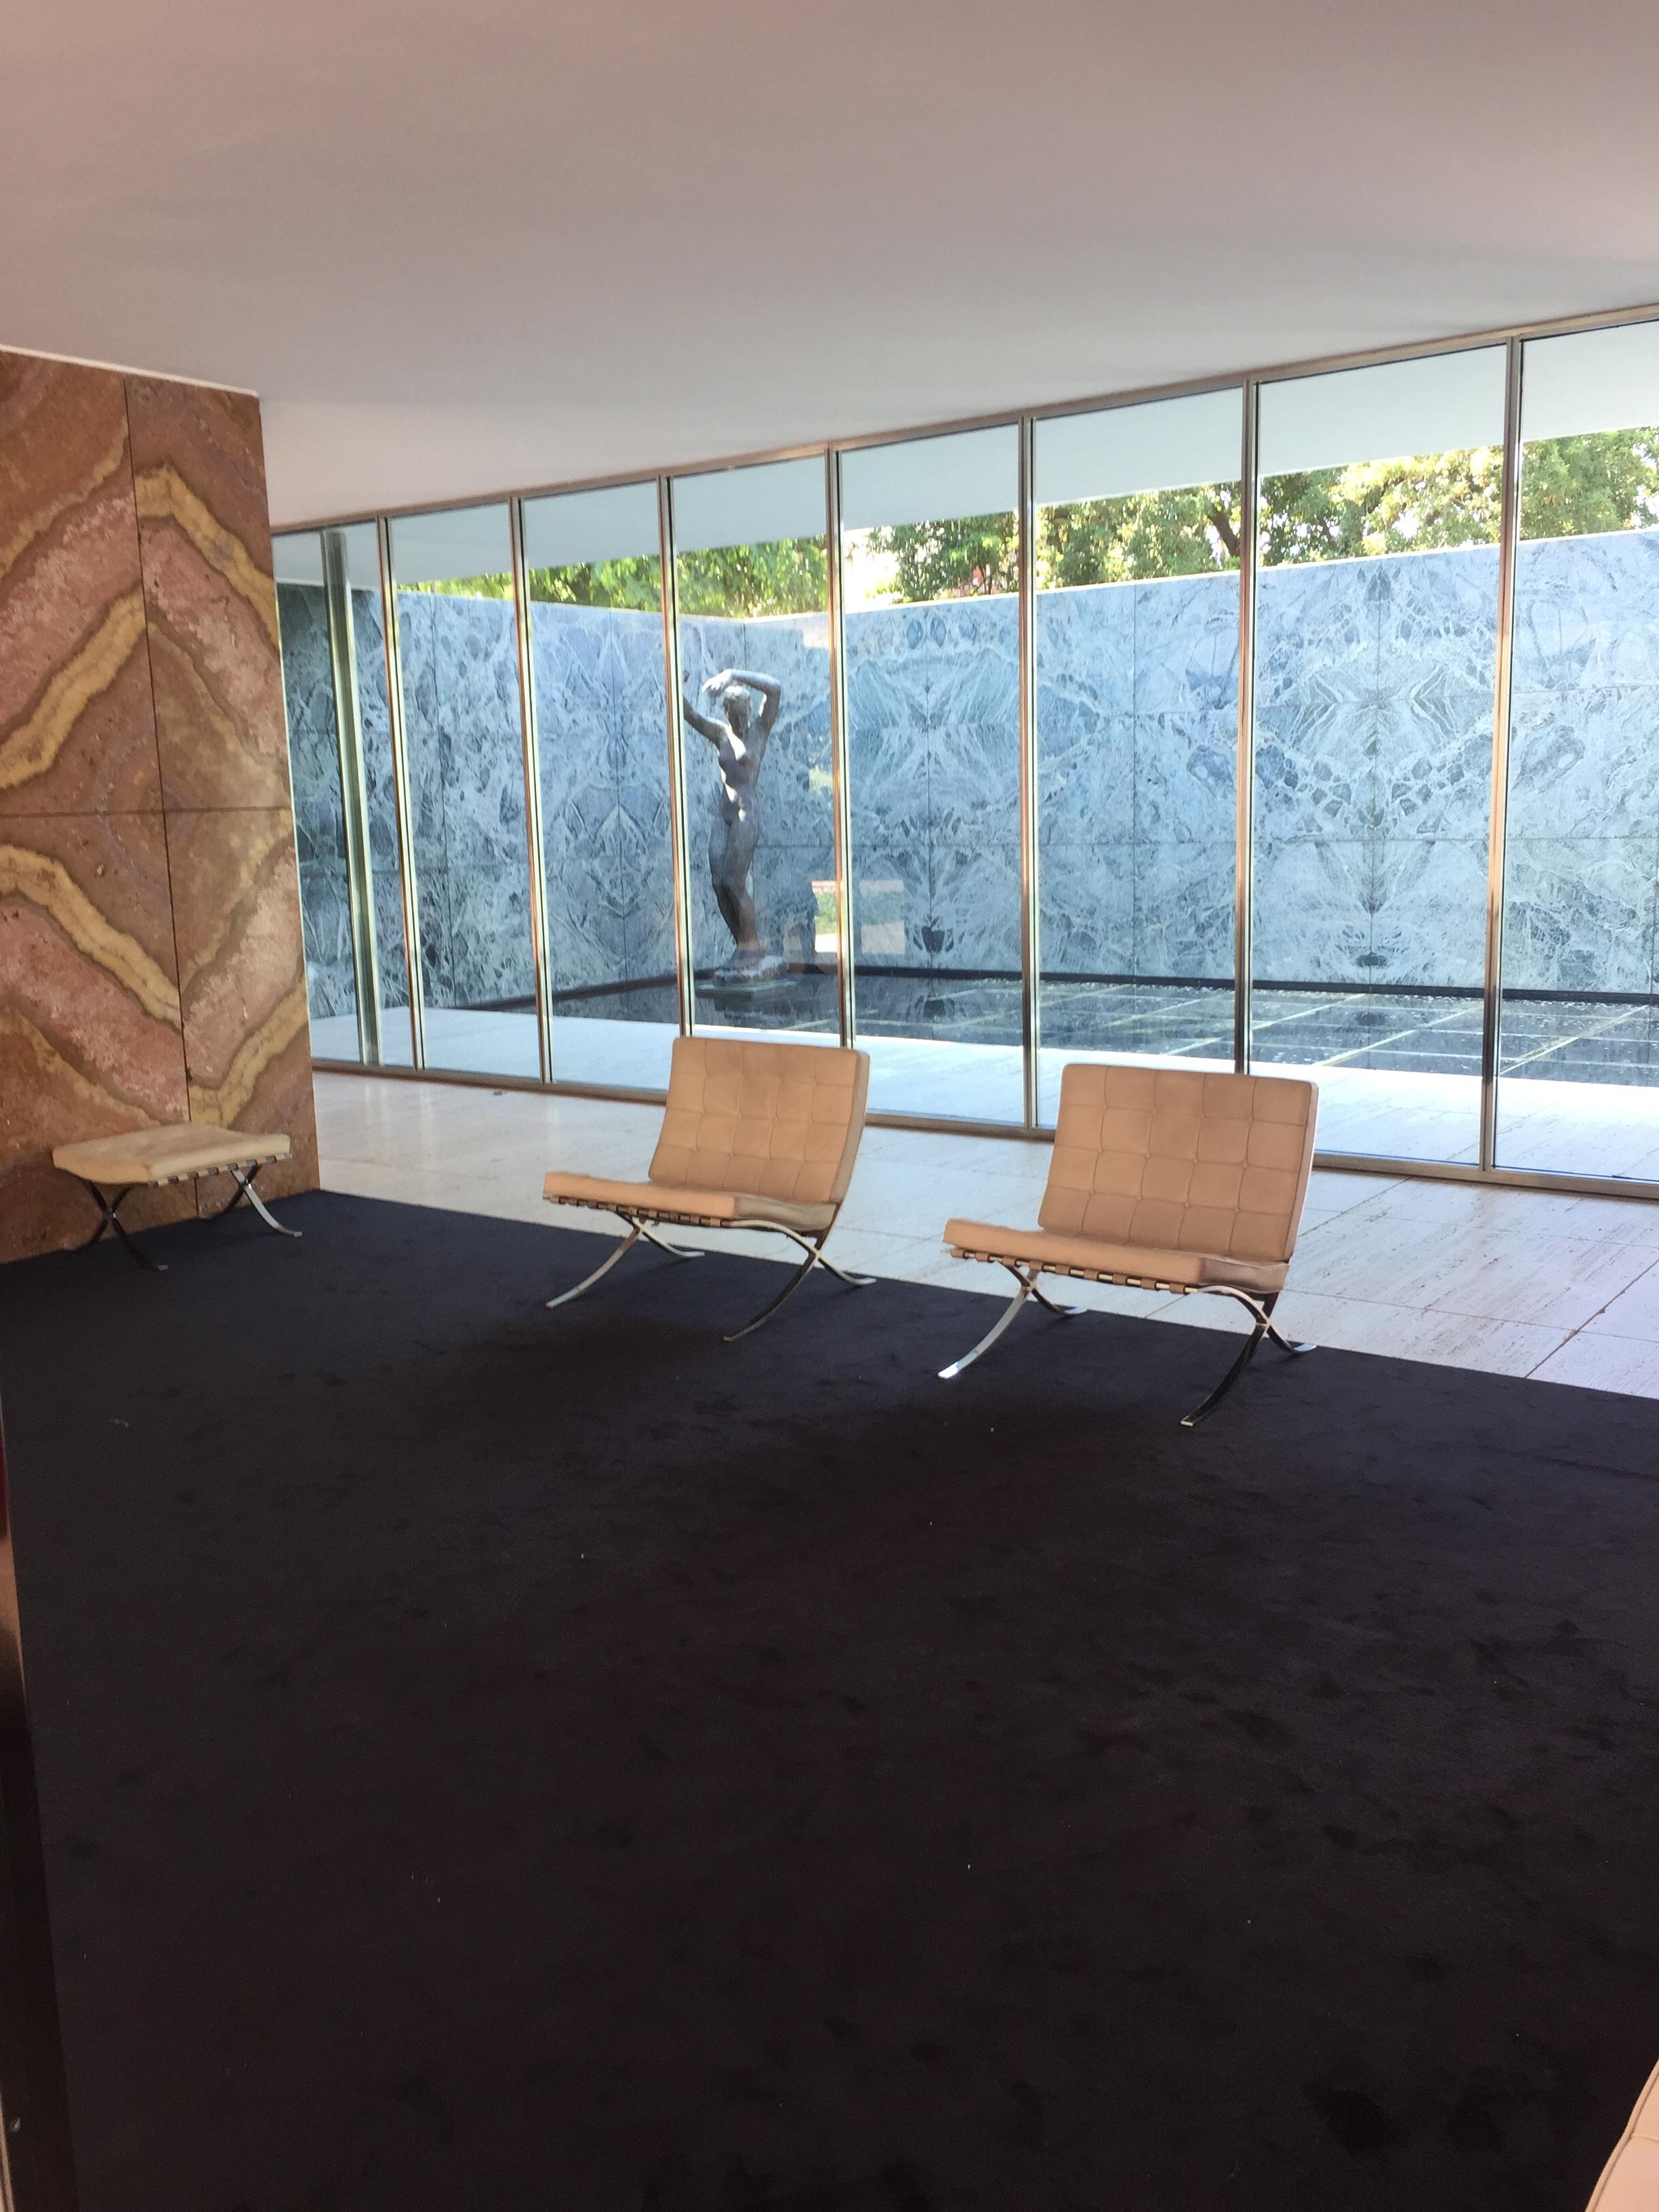 The Barcelona chair... in the Barcelona Pavilion... in Barcelona, Spain